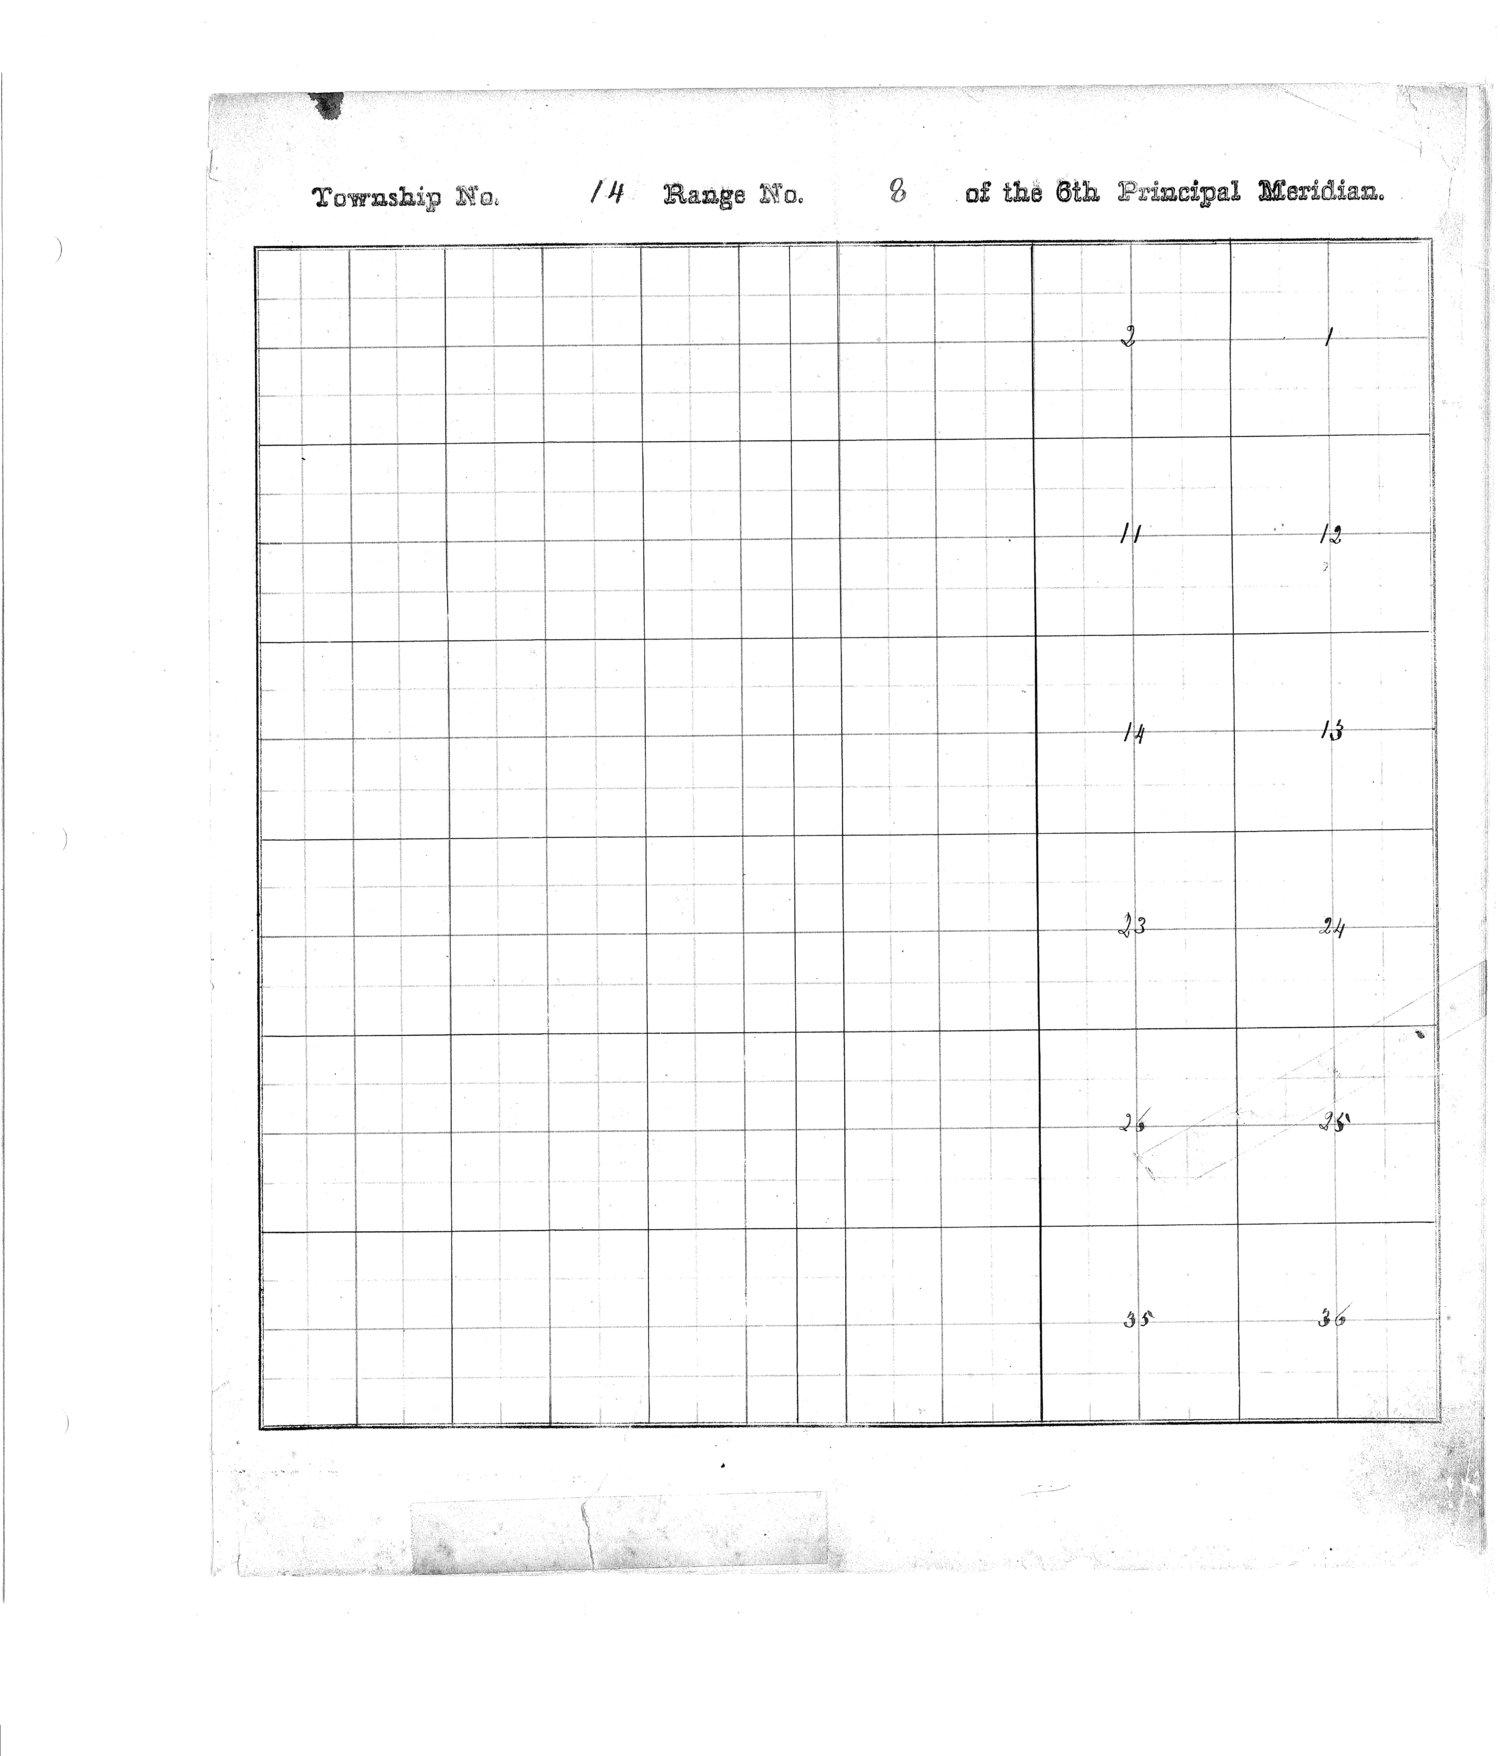 Richardson County and Wabaunsee County, Kansas, survey - 5